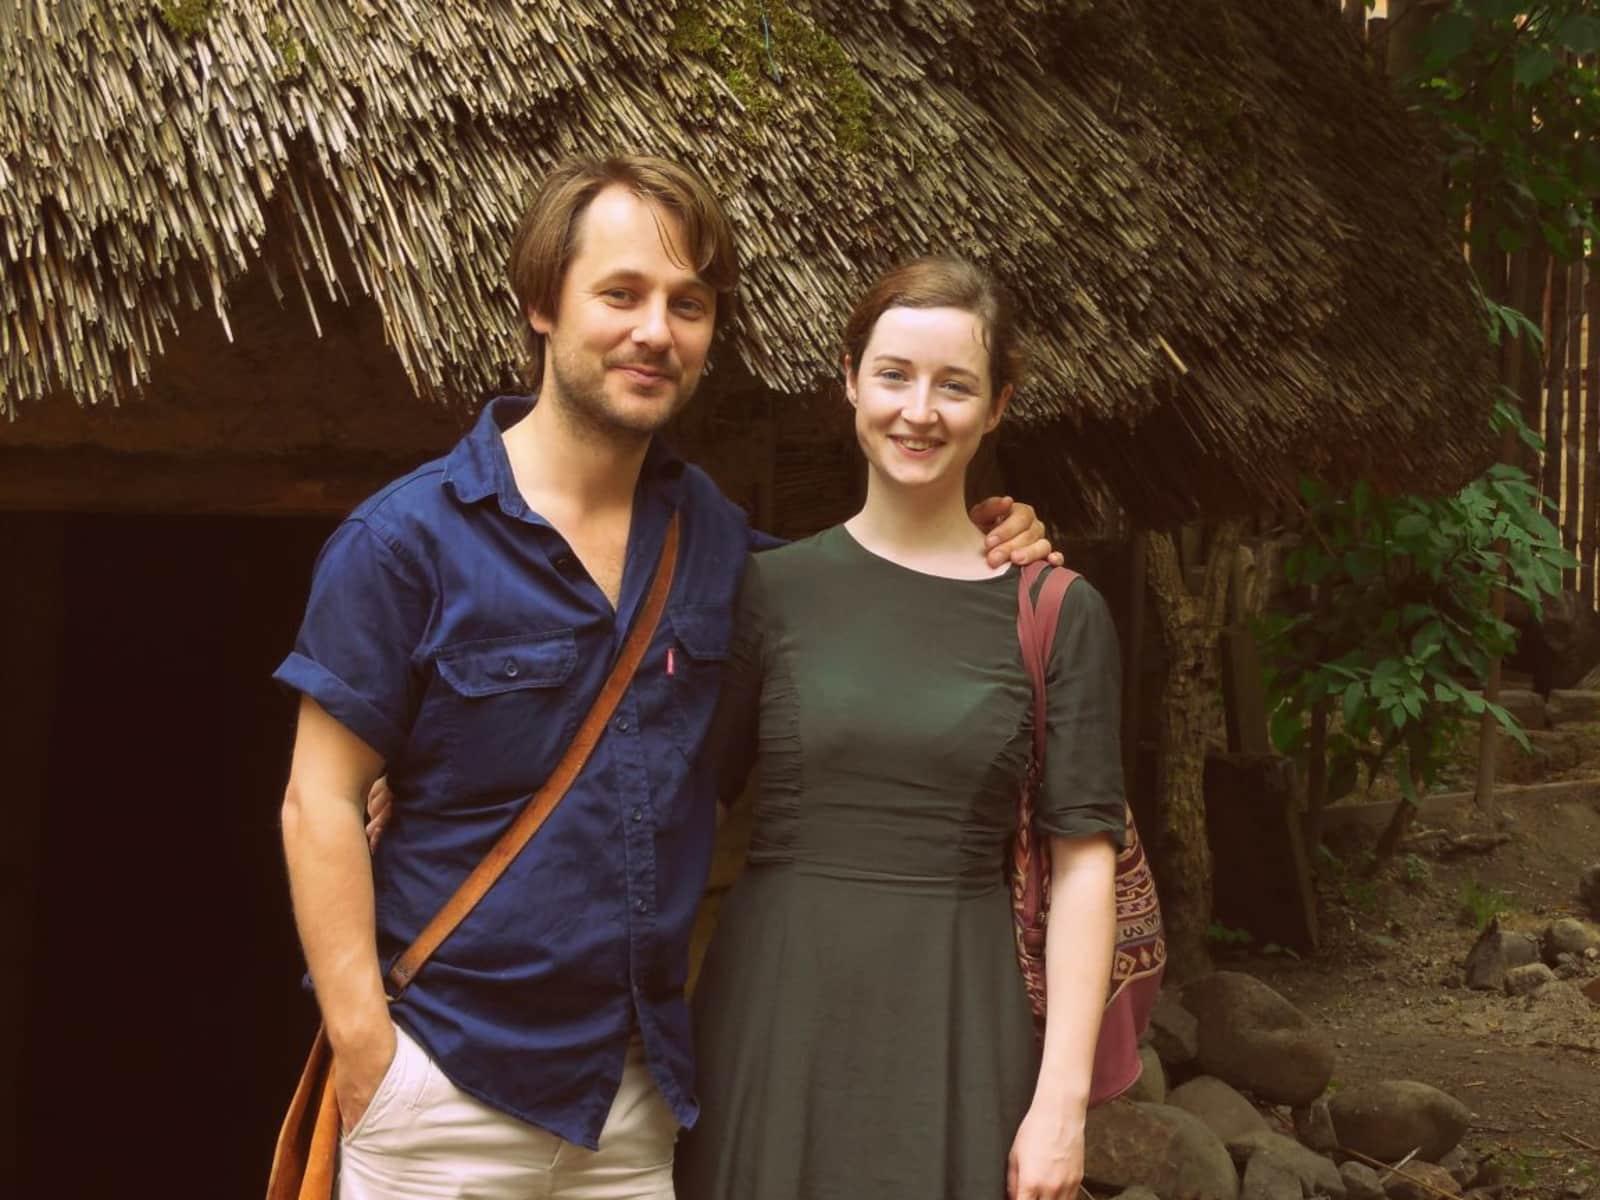 Fiona & Benjamin from Berlin, Germany